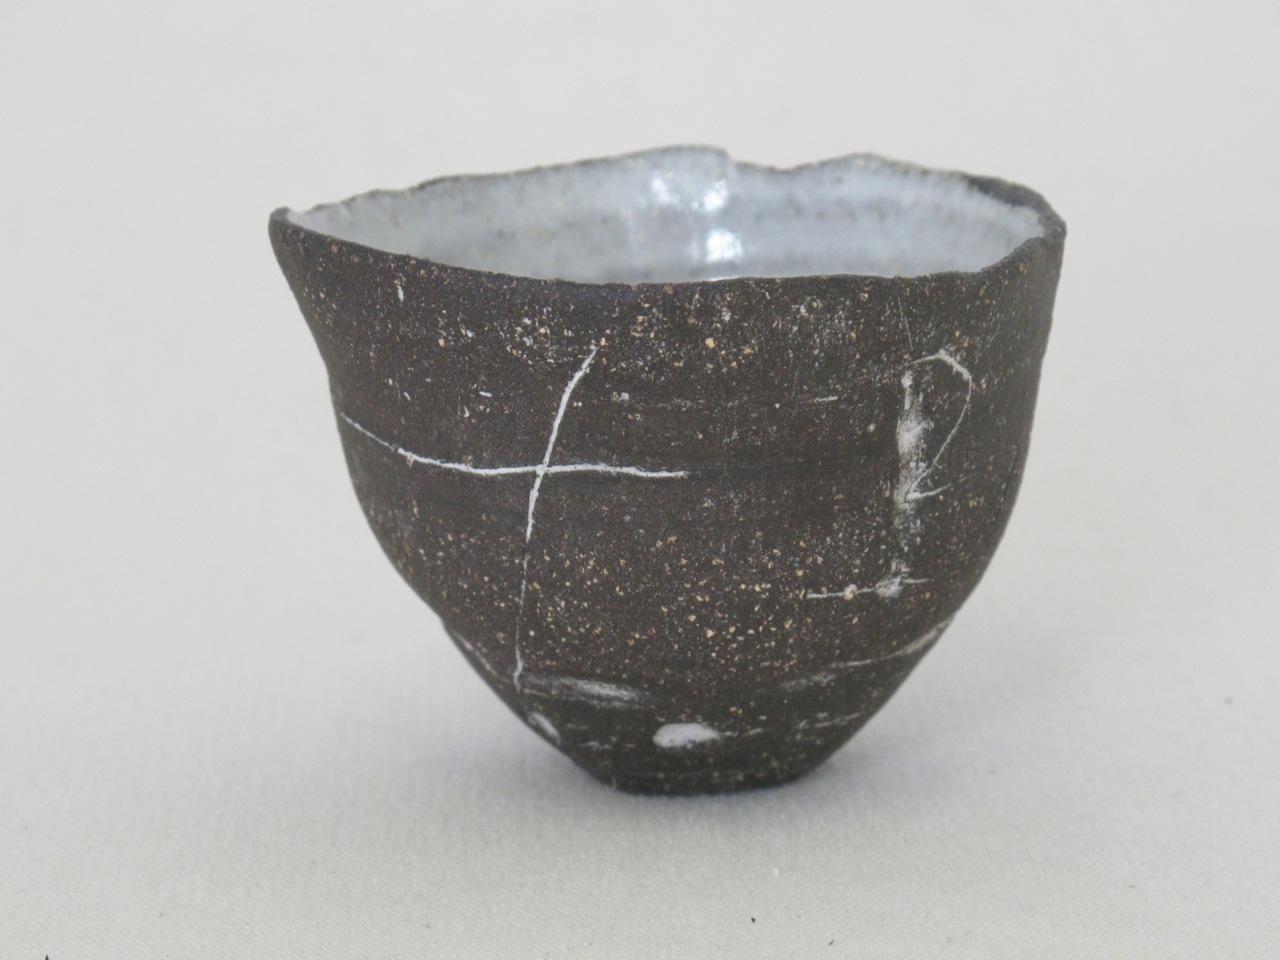 Clementina van der Walt Ceramic Bowl